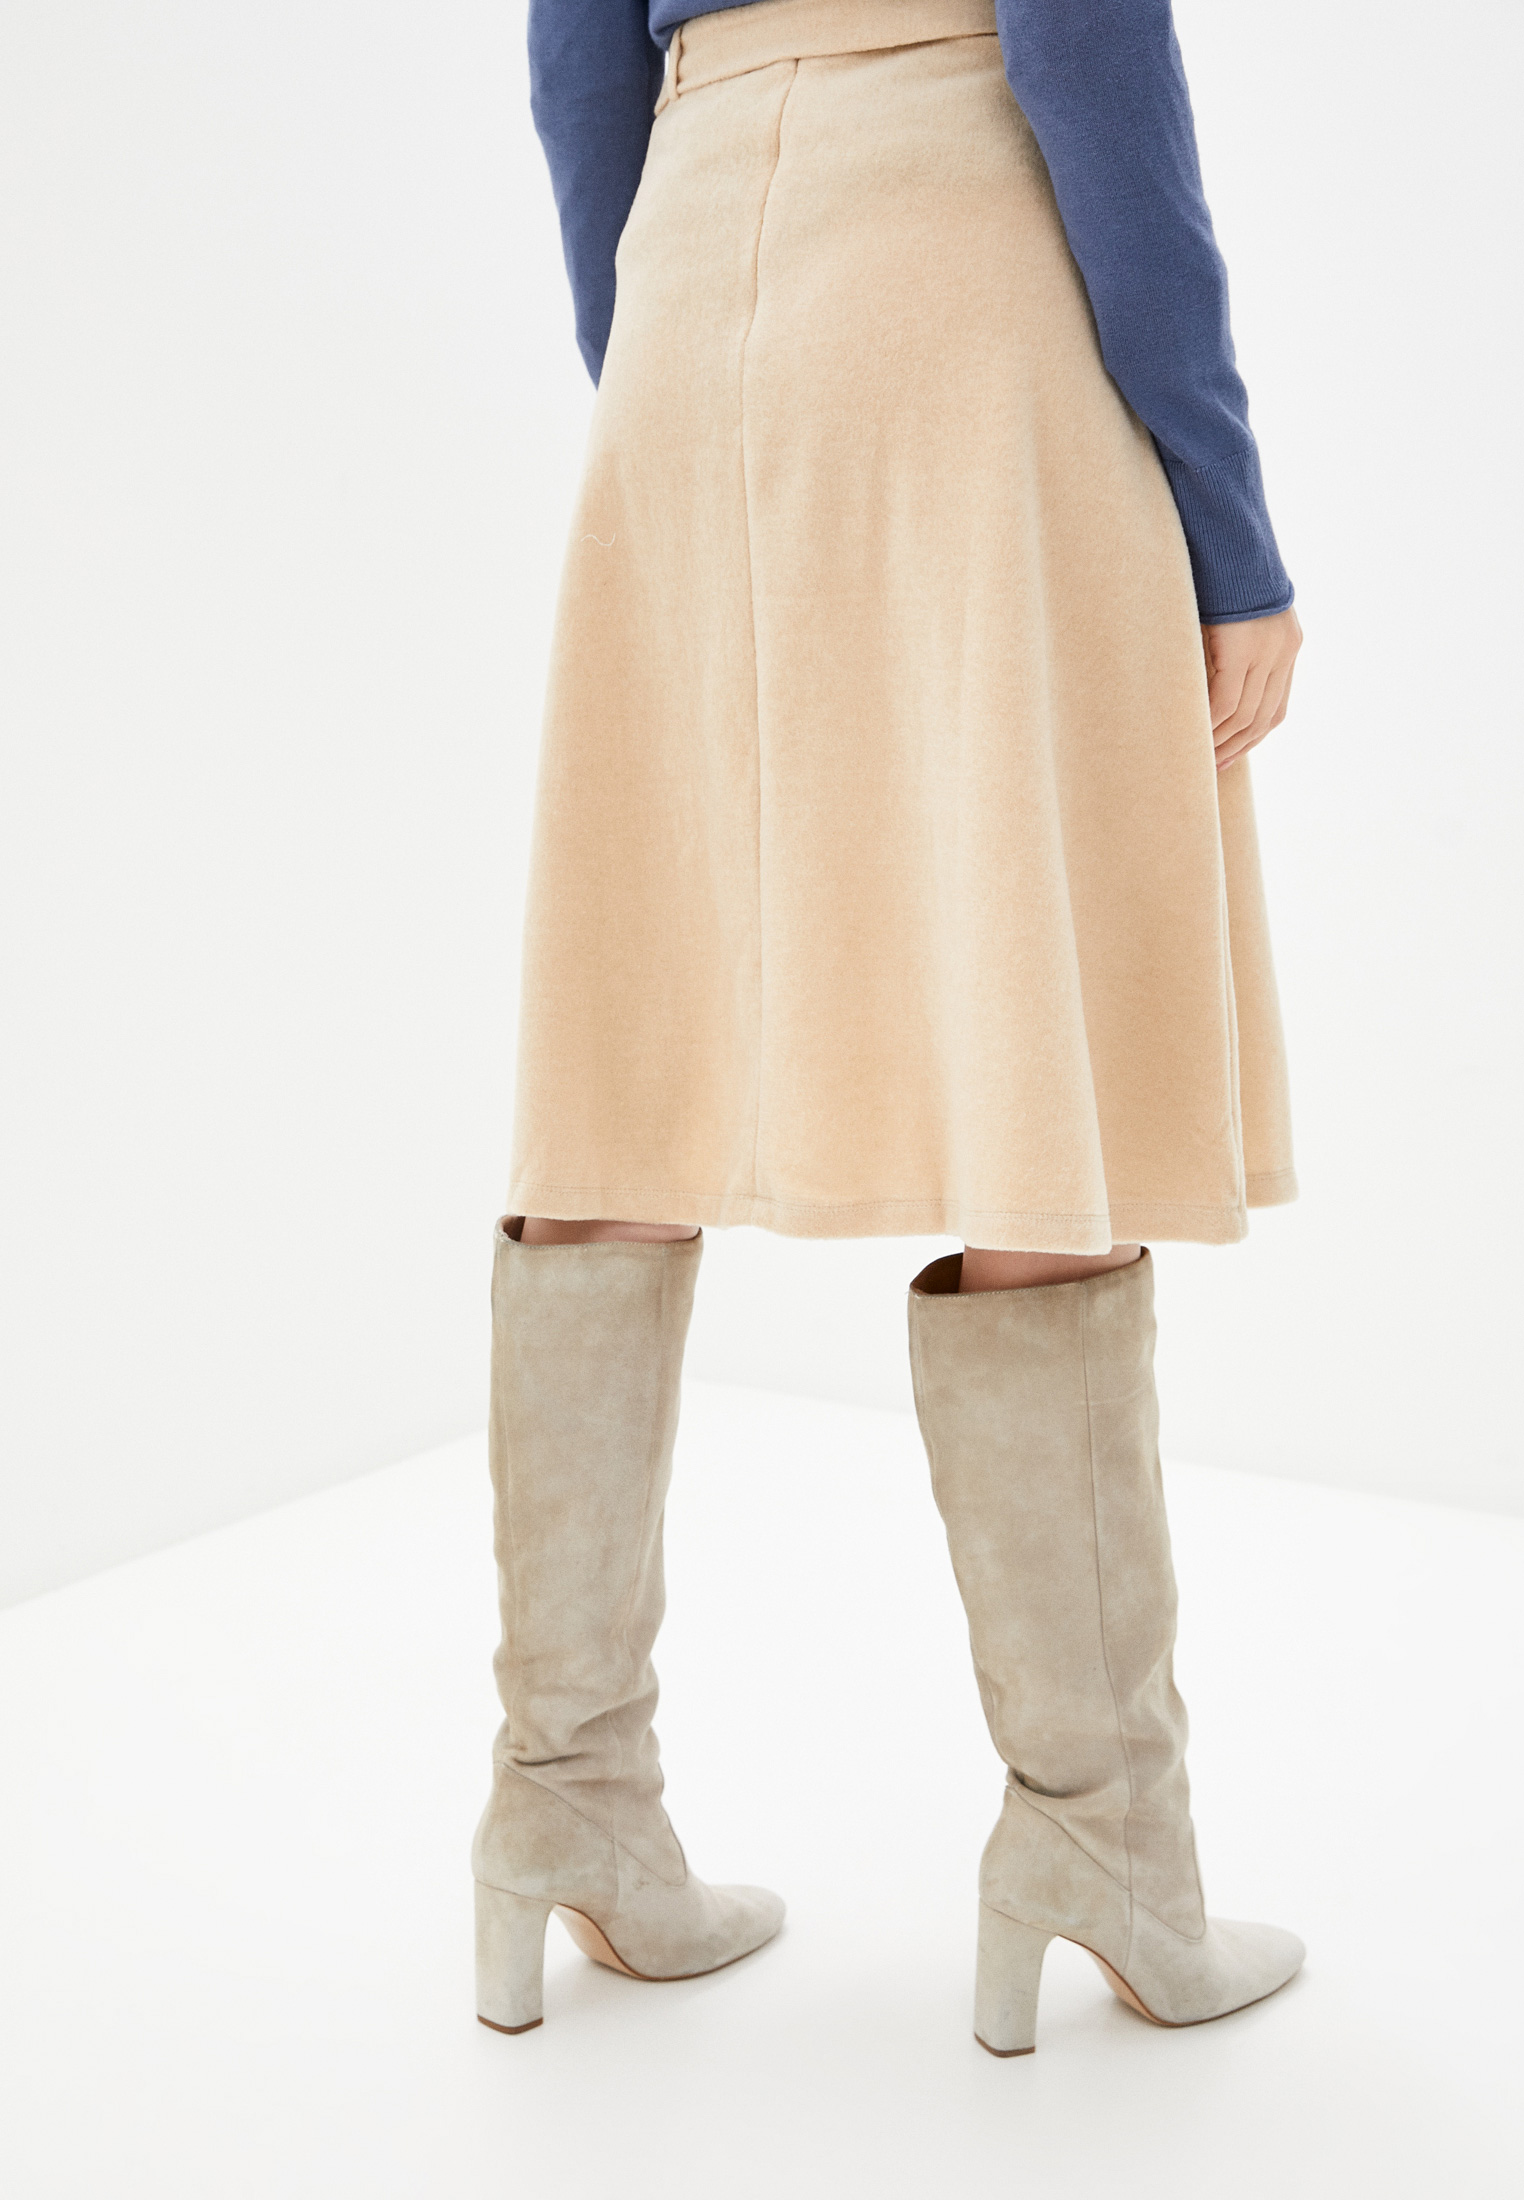 Широкая юбка Zabaione YU-751-0018: изображение 3